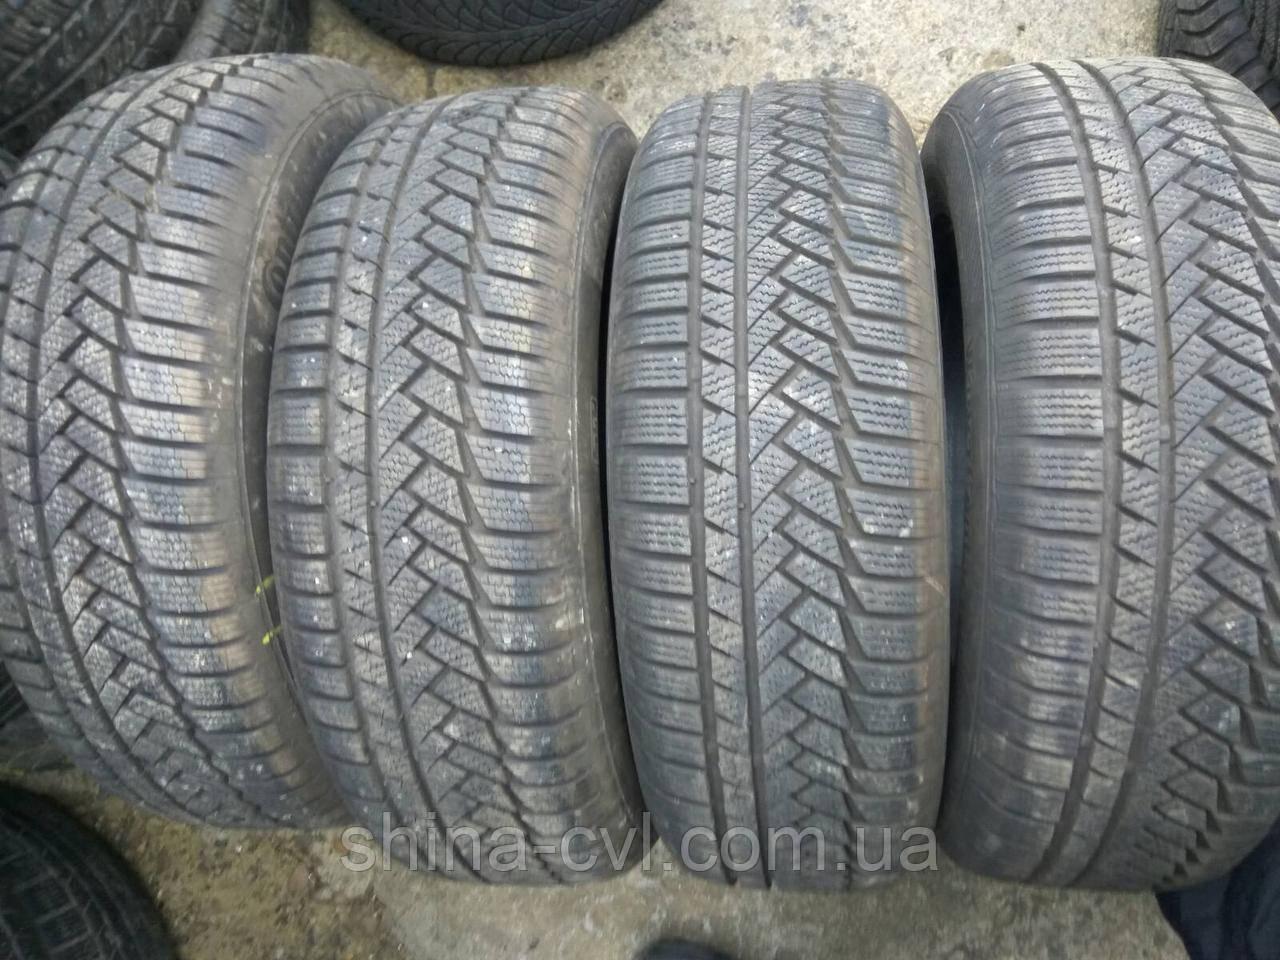 Зимові шини 215/65 R16 98H CONTINENTAL WINTER CONTACT TS 850P